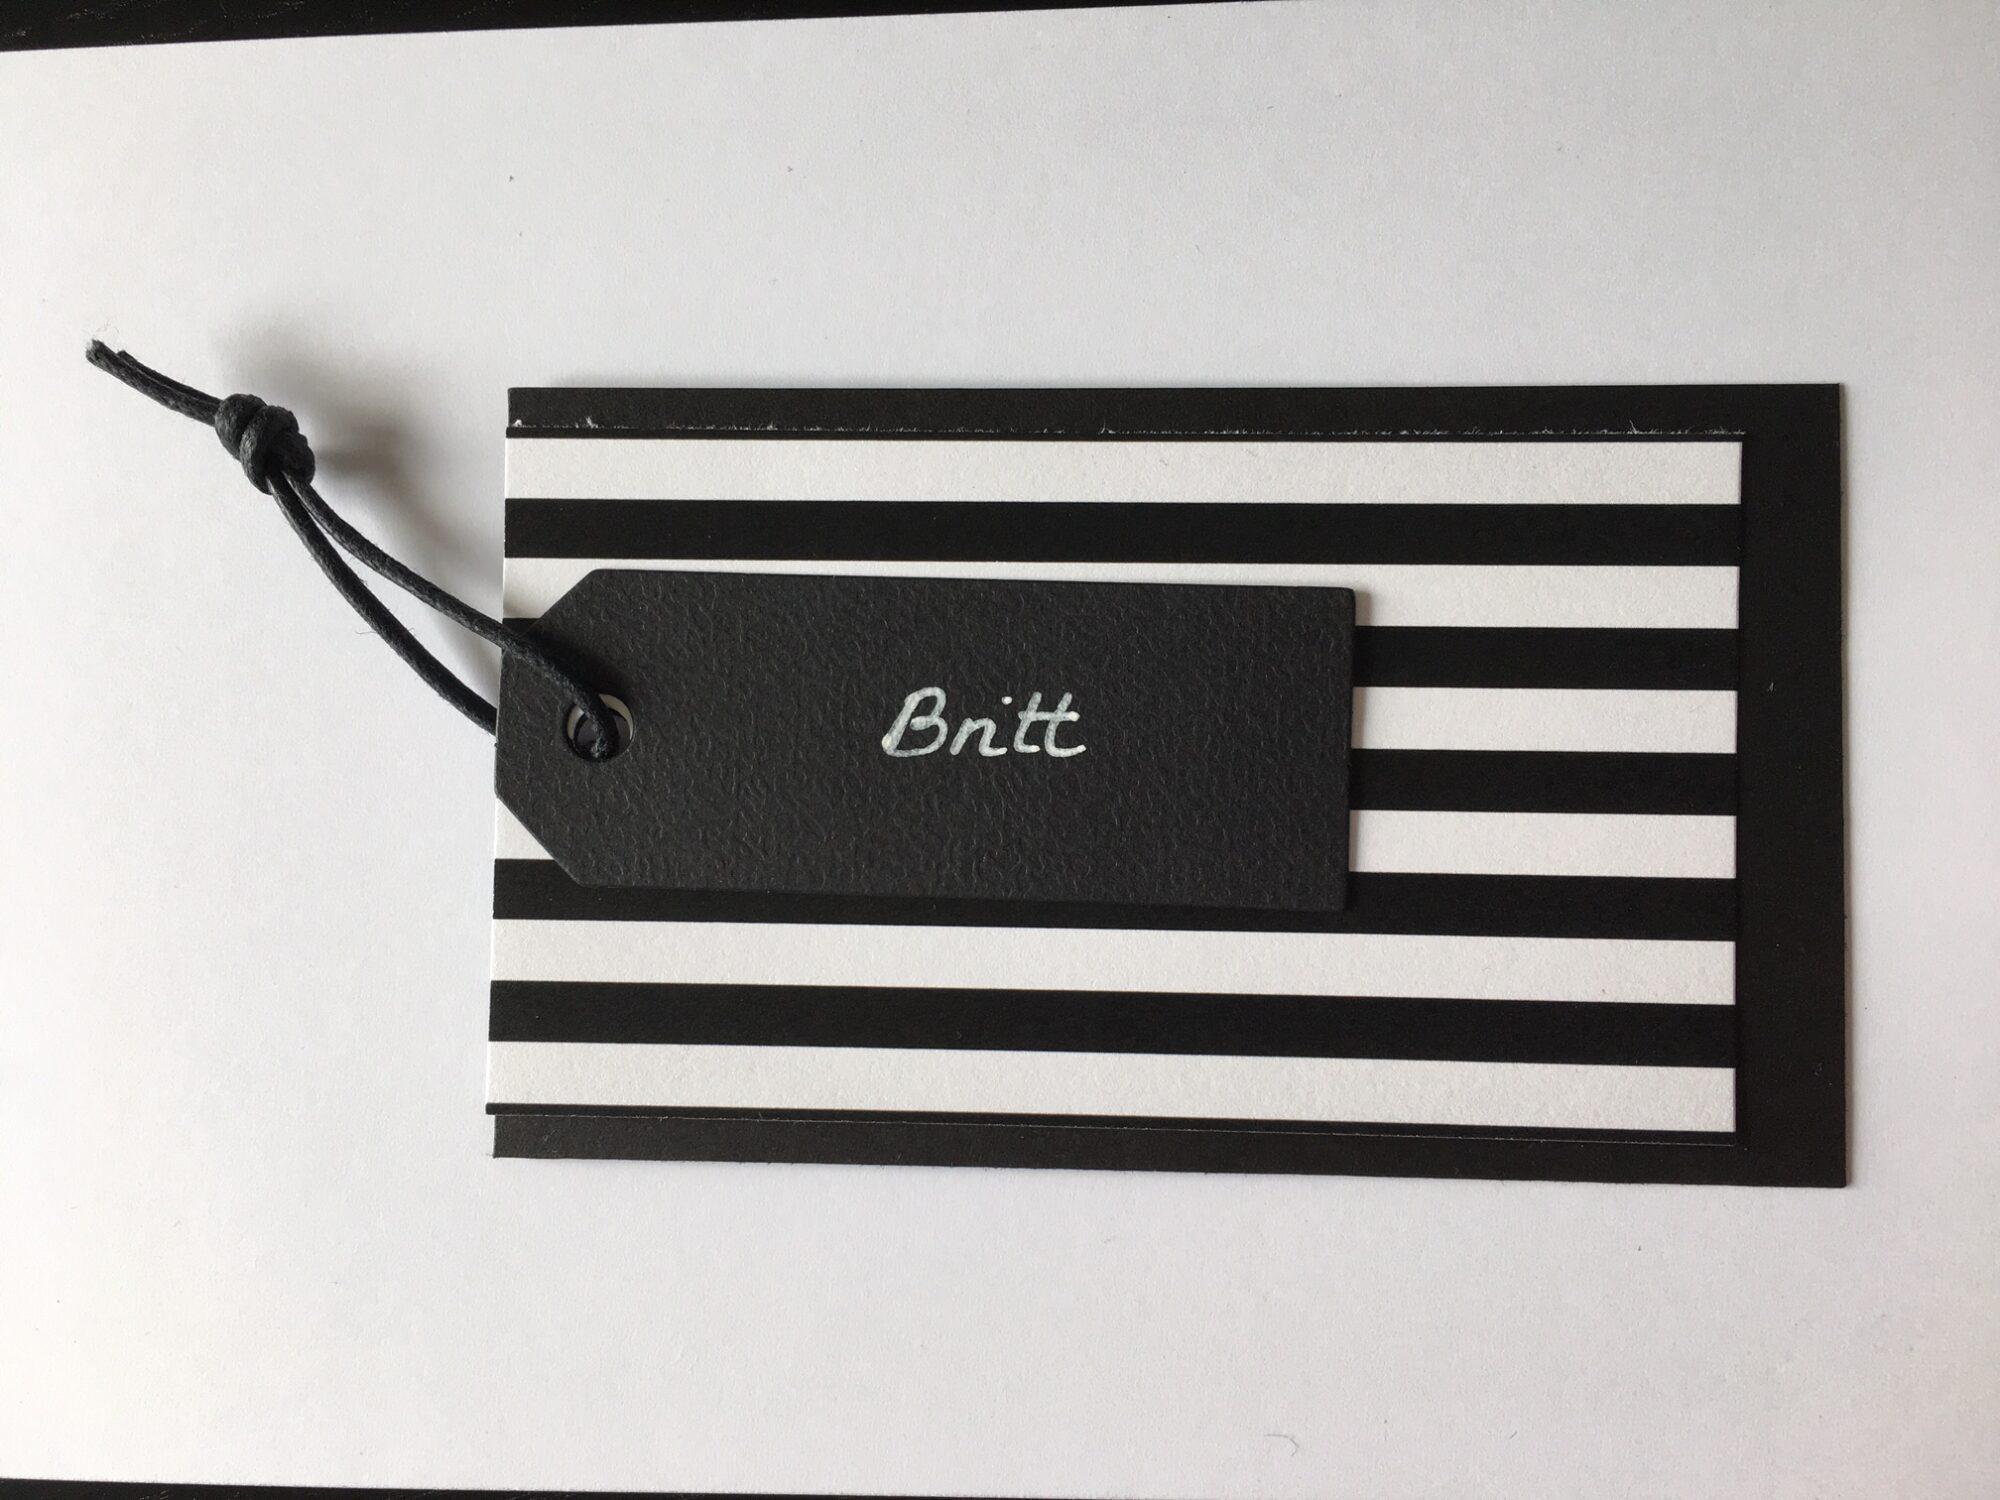 Bordkort i sort og hvid